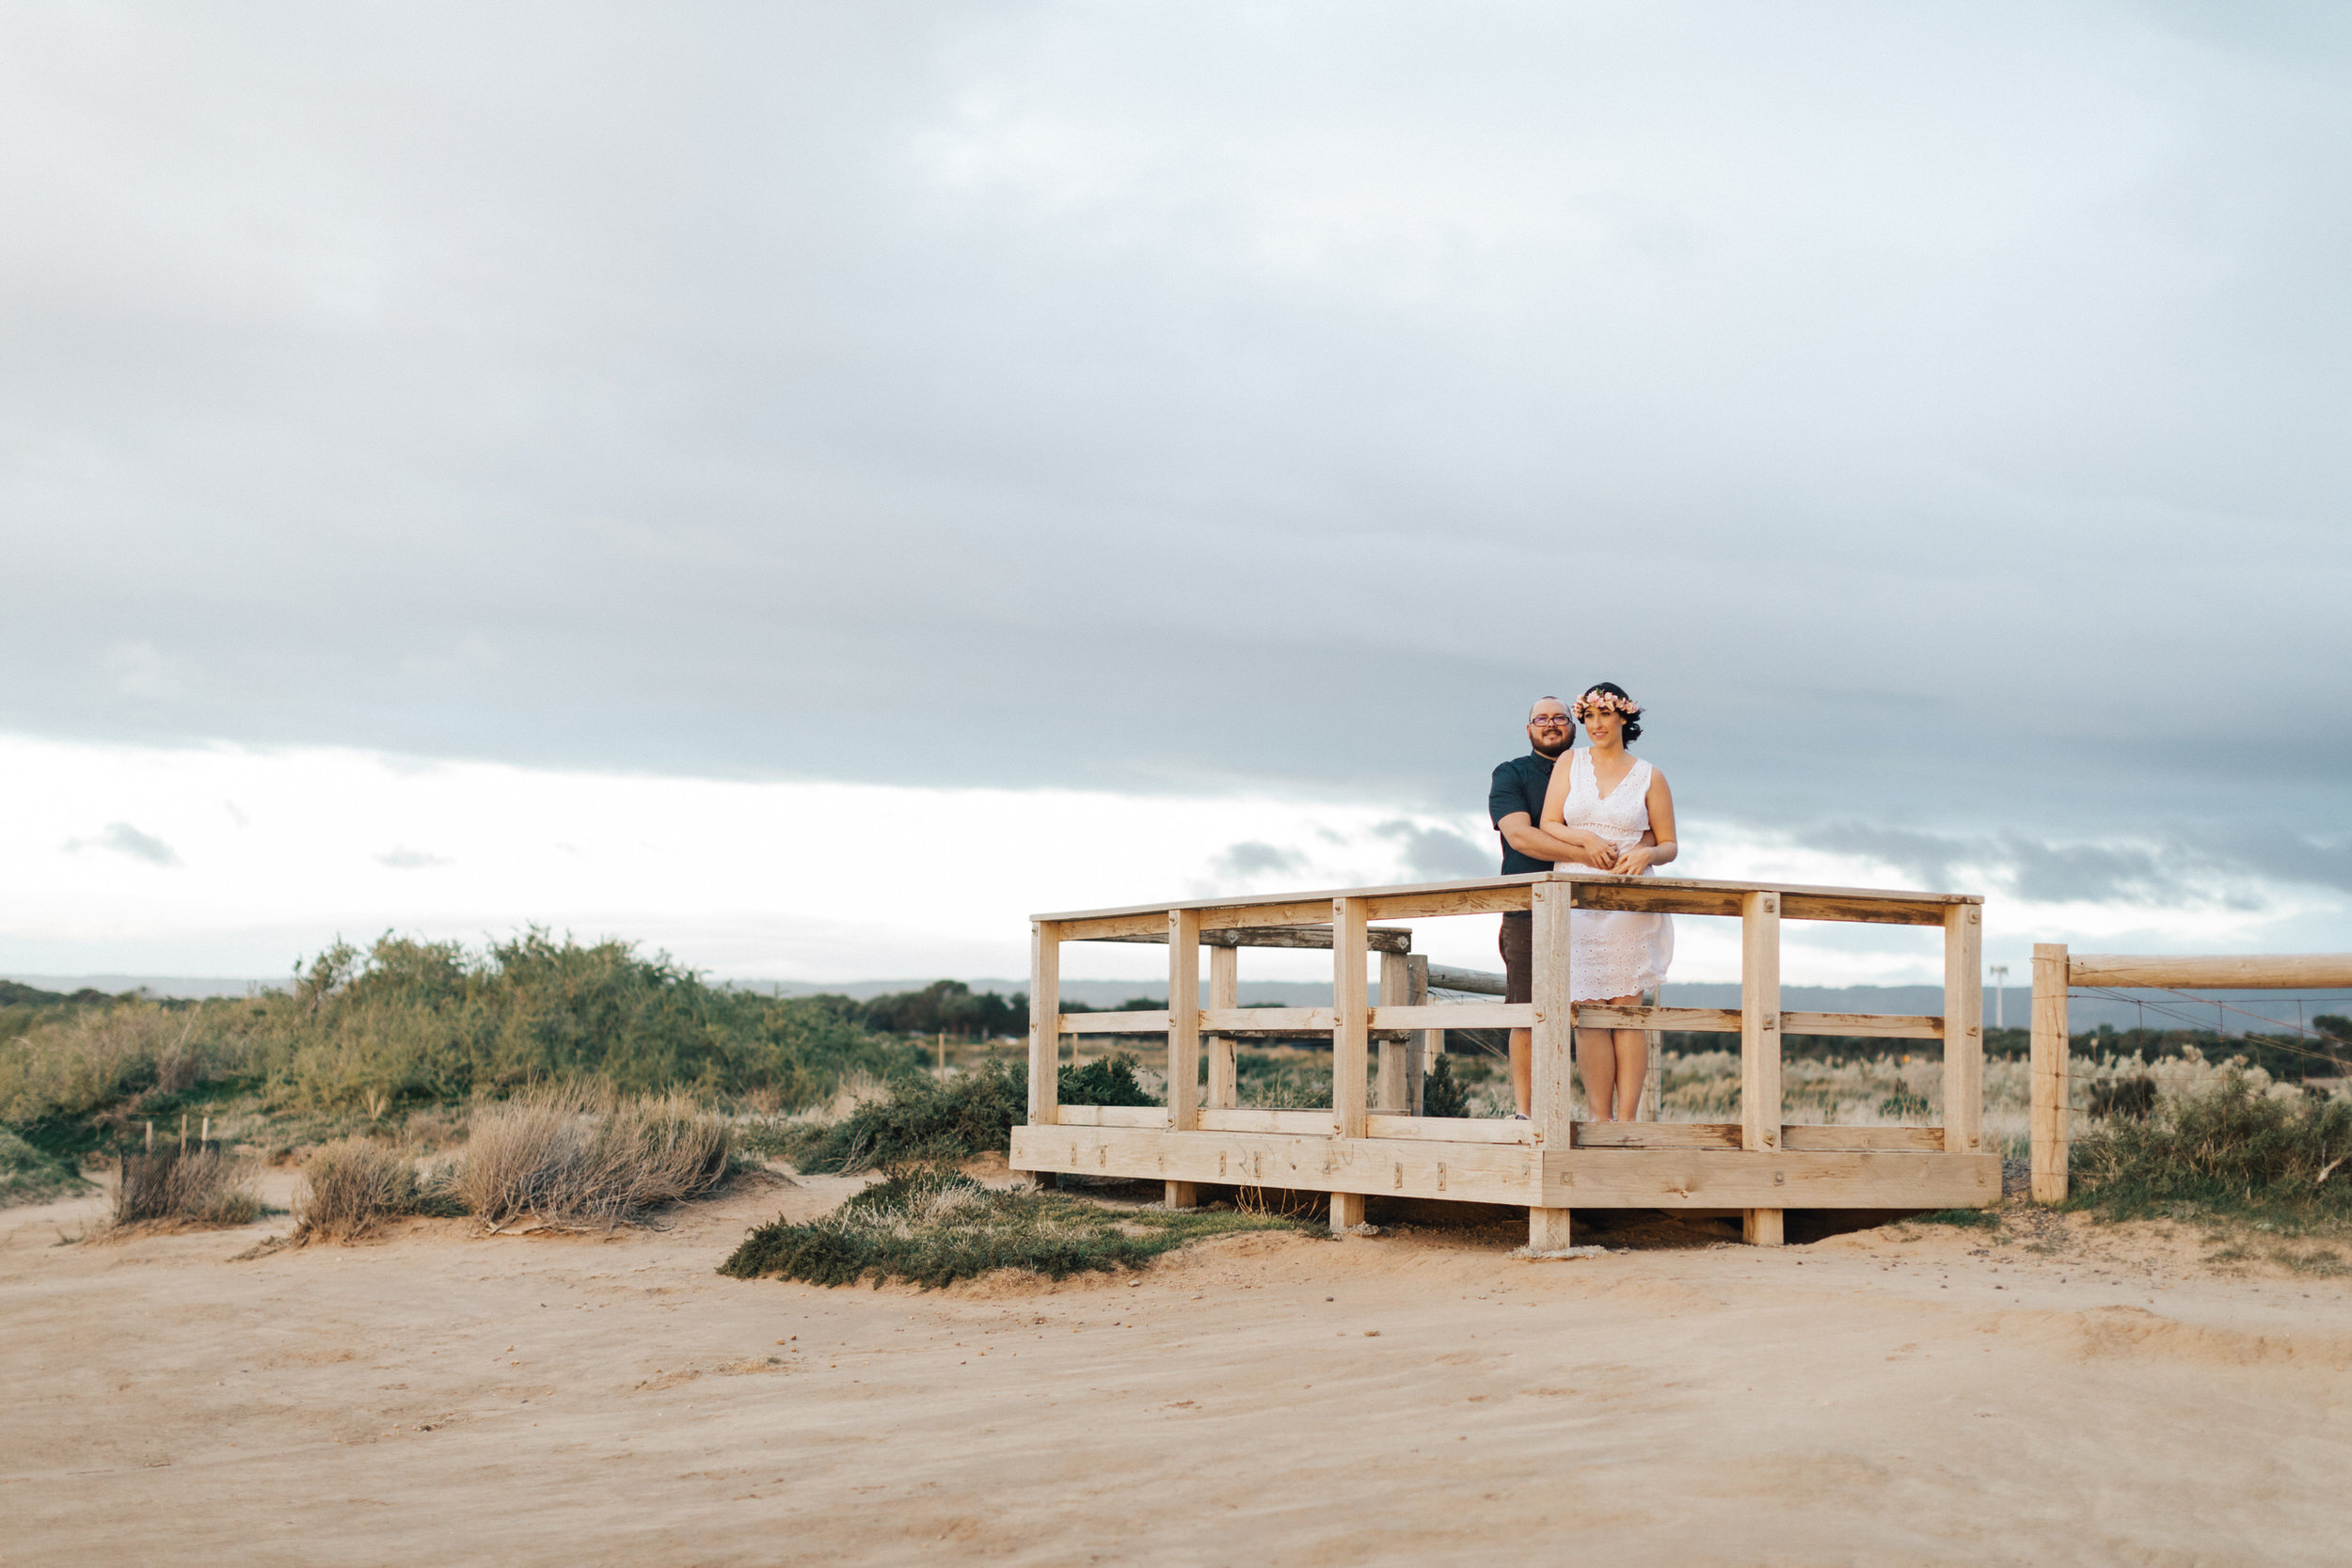 Sunset Beach Portraits Gull Rock South Australia 007.jpg